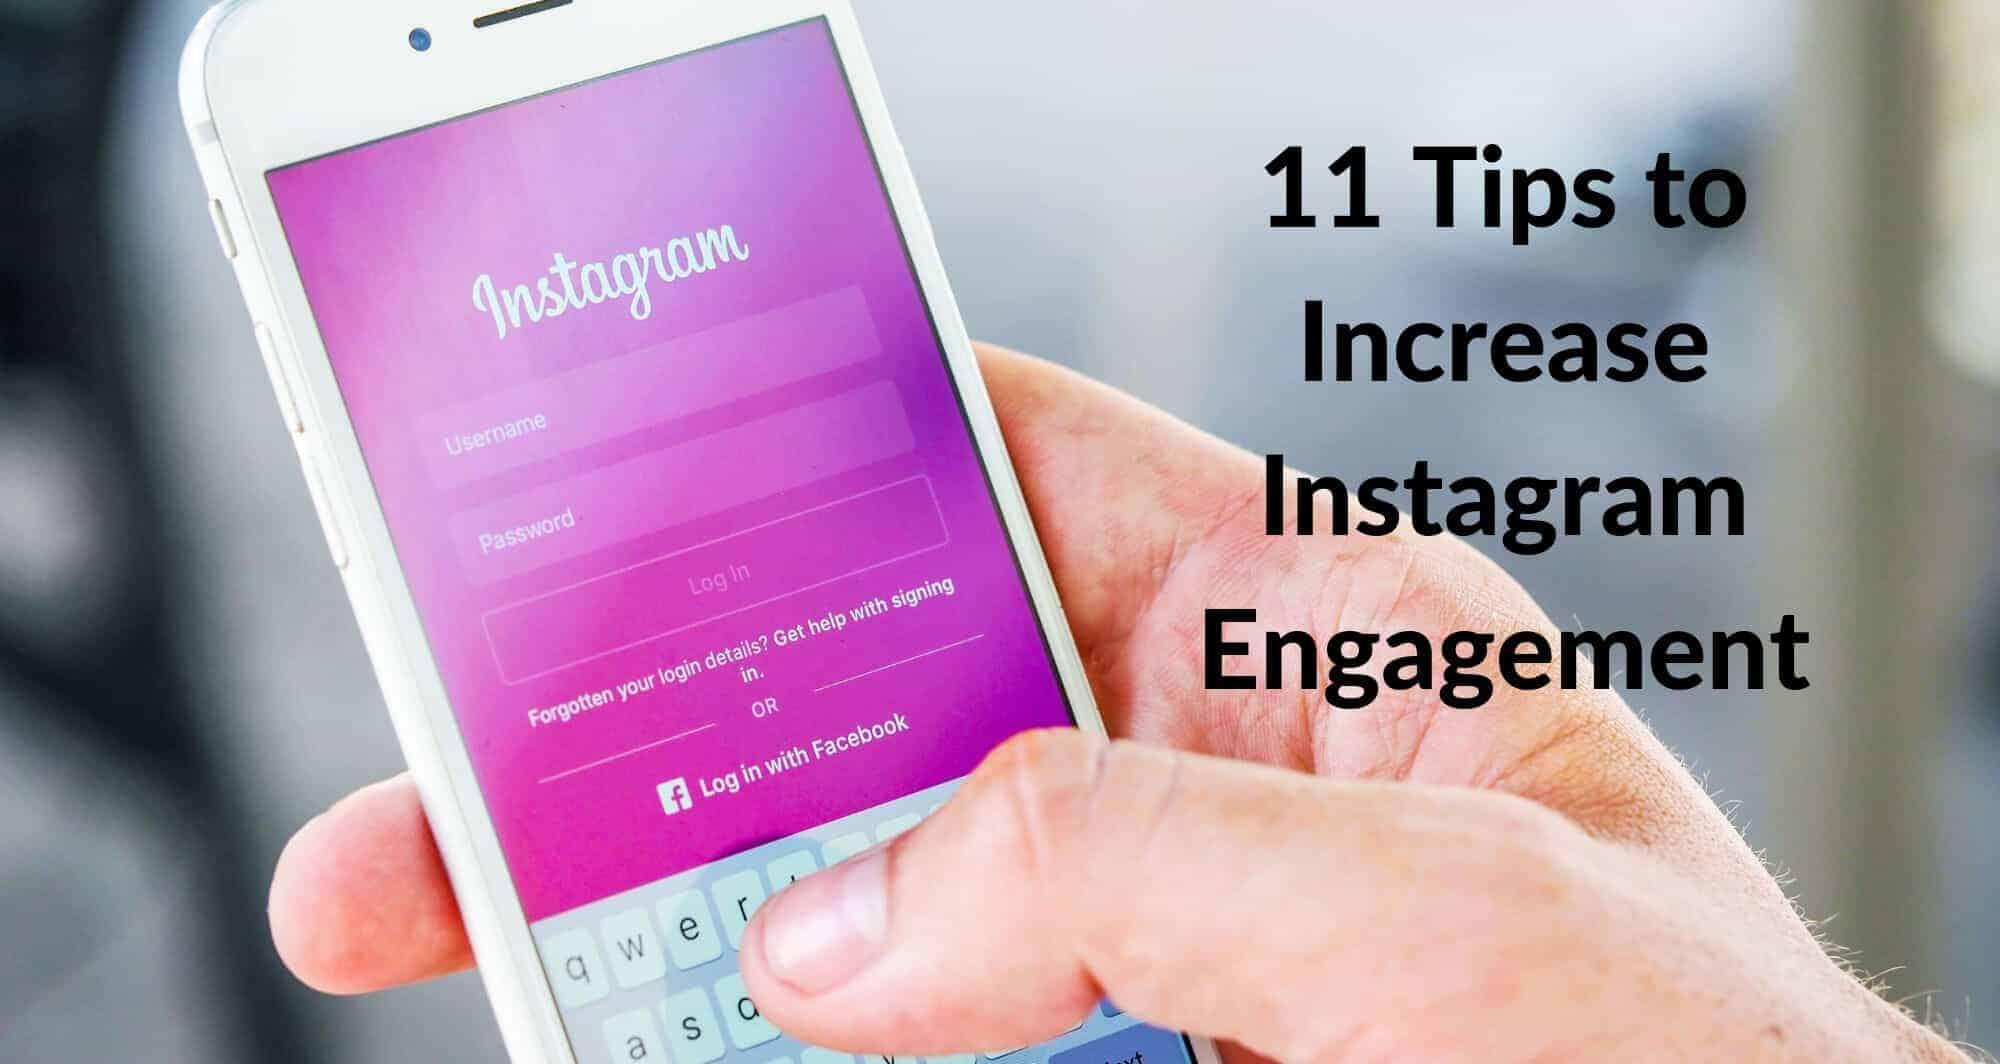 Increase Instagram Engagement